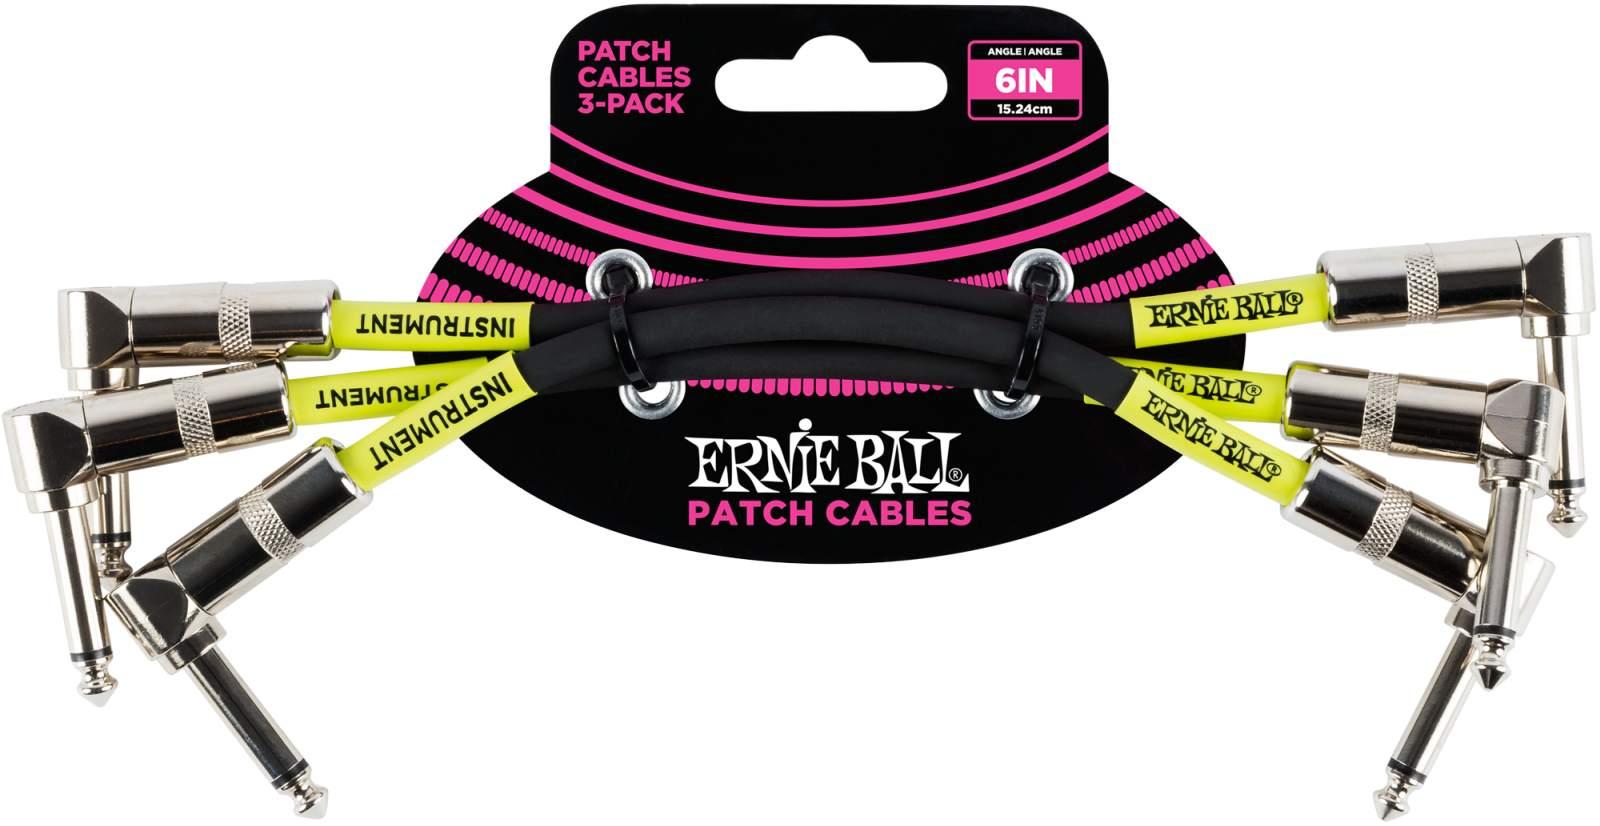 Ernie Ball EB6050 Patchkabel 3er Pack 15cm Black